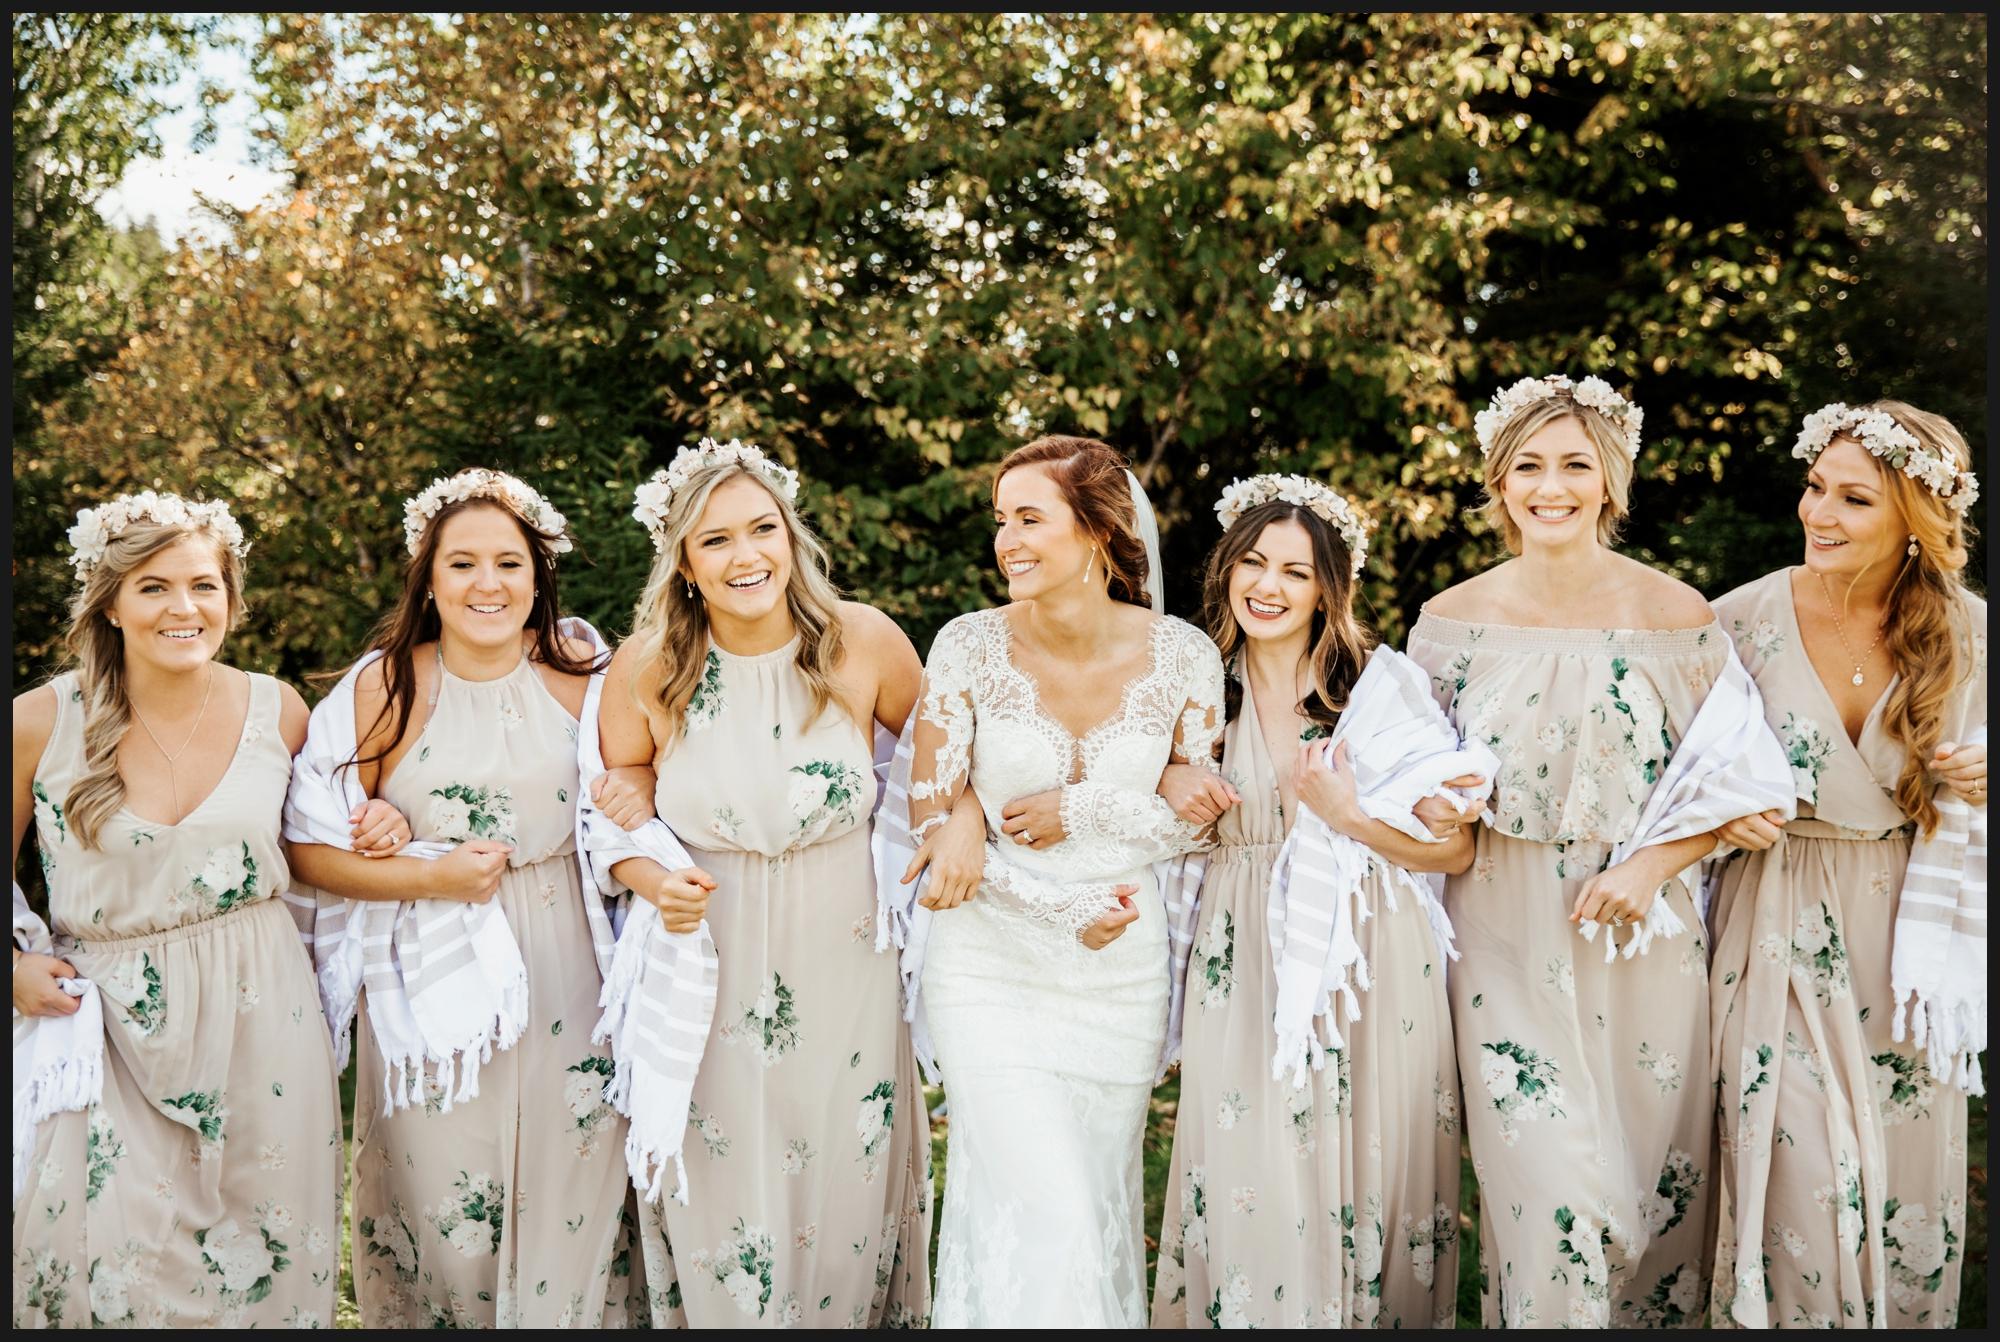 Orlando-Wedding-Photographer-destination-wedding-photographer-florida-wedding-photographer-hawaii-wedding-photographer_0152.jpg